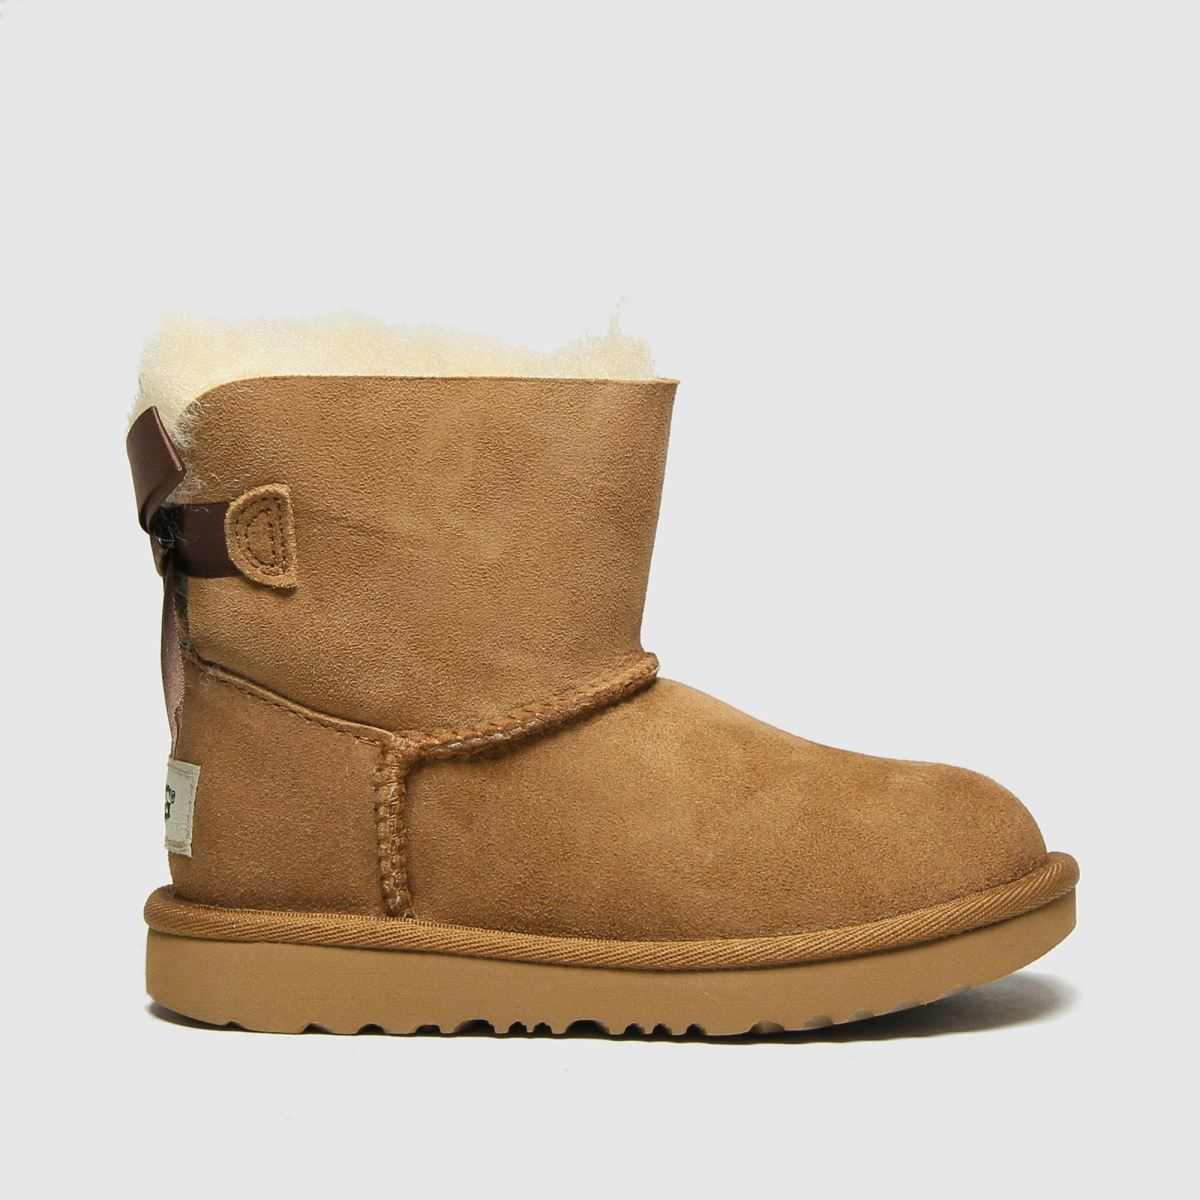 ugg tan mini bailey bow ii Girls Toddler Boots